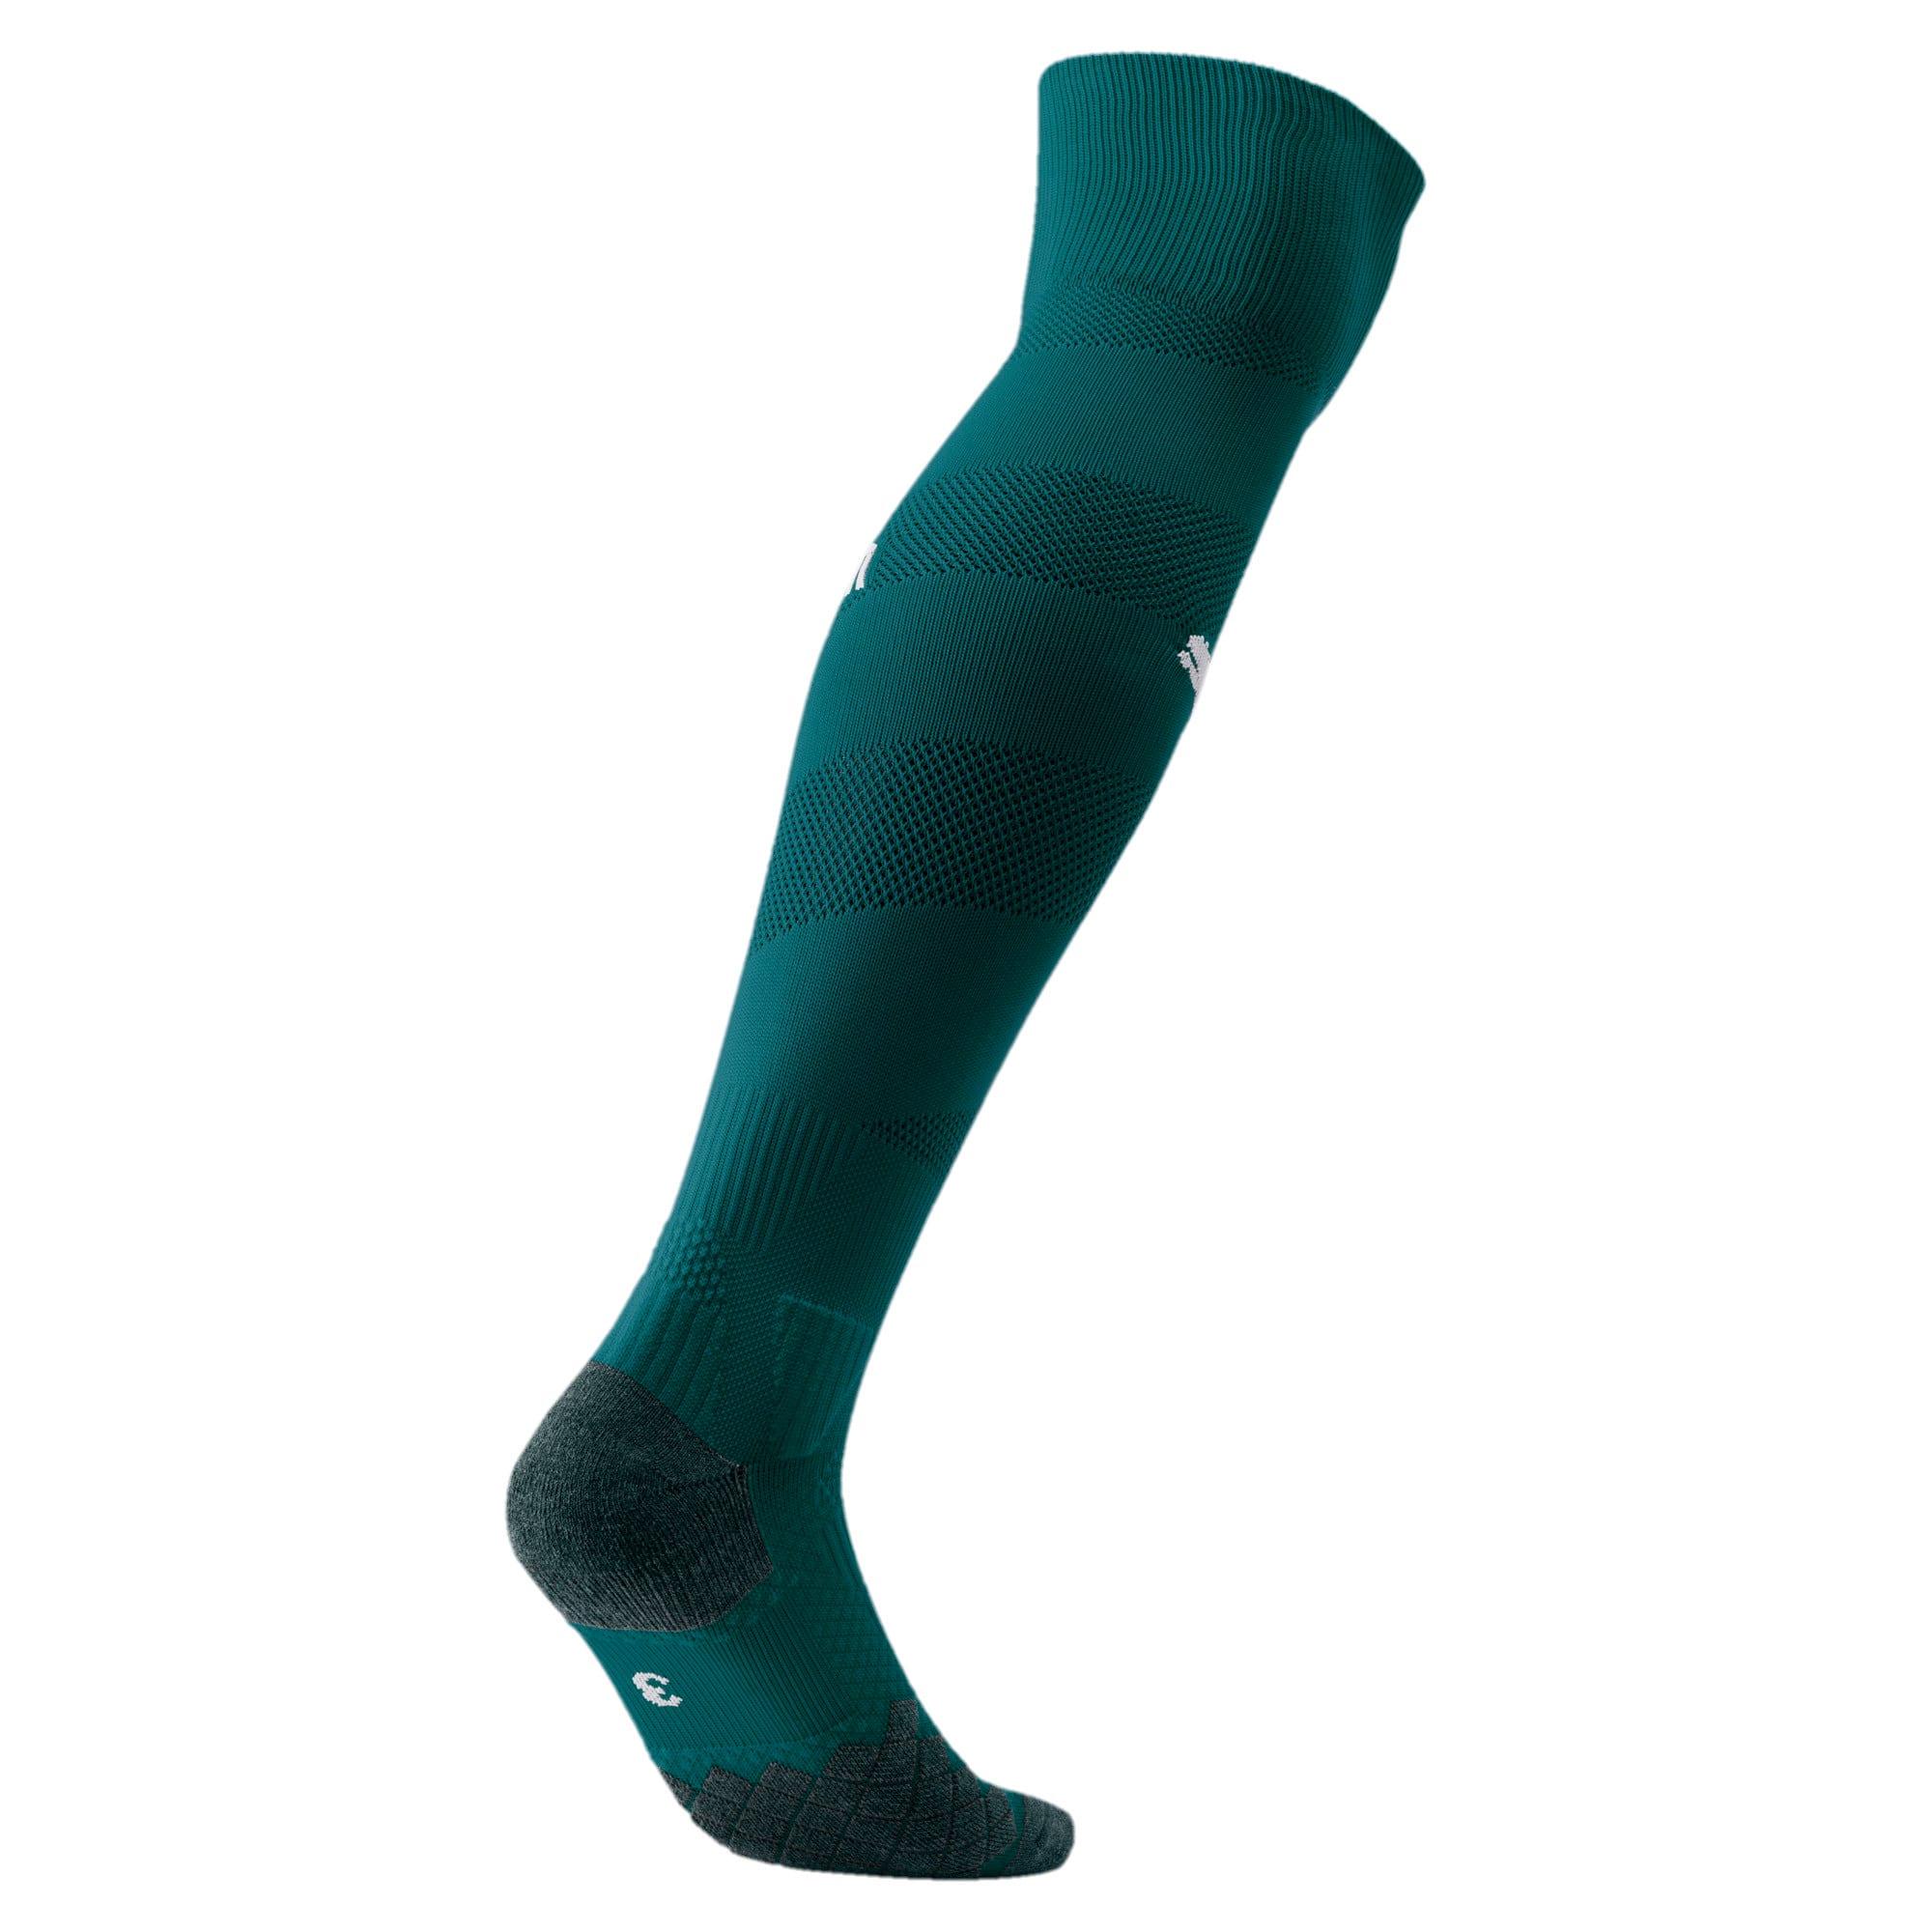 Thumbnail 2 of Man City Spiral Men's Socks, Ponderosa Pine-Puma White, medium